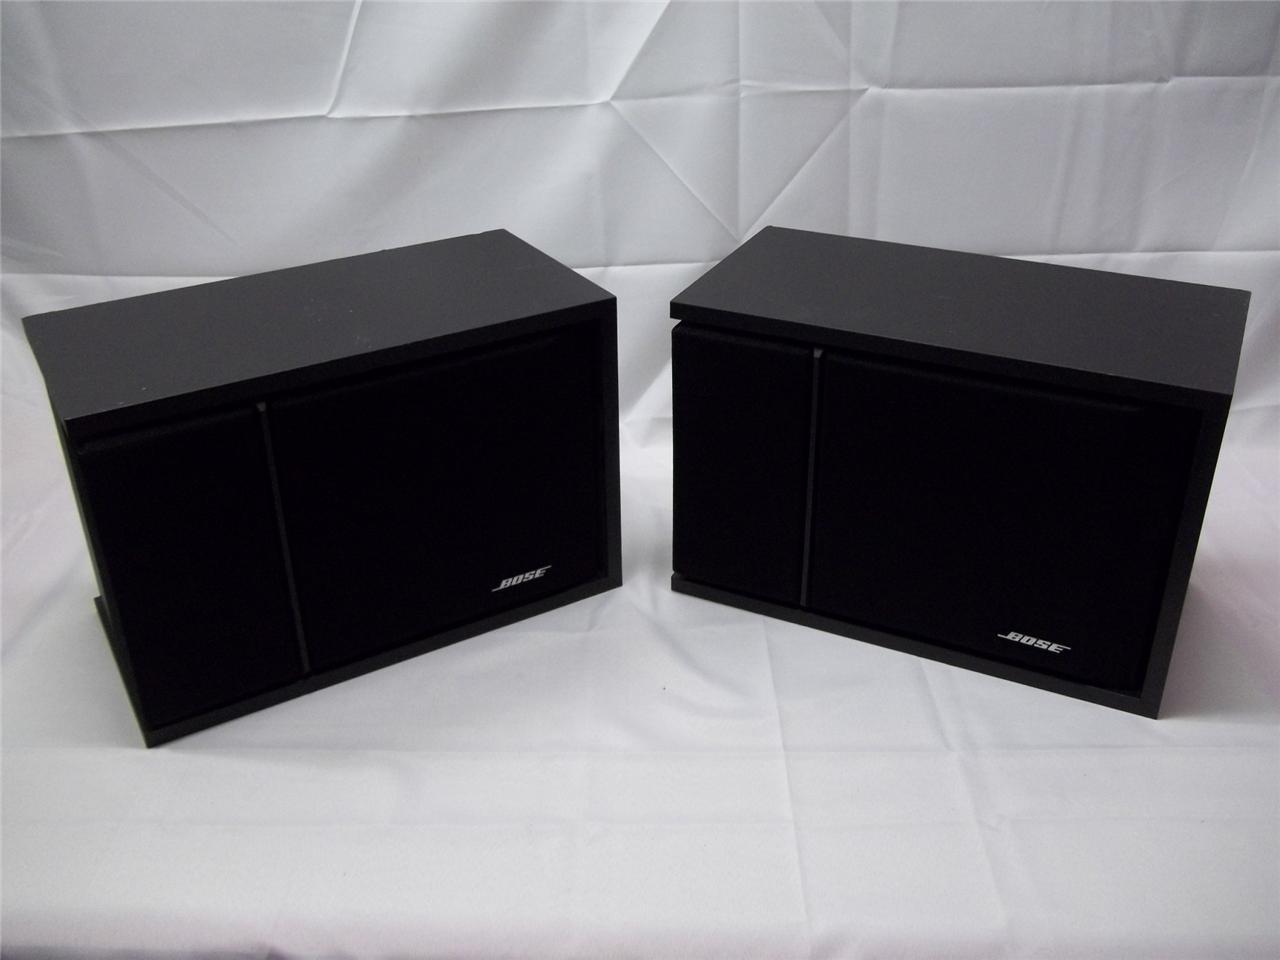 2 Bose 201 Series III Bookshelf Speakers Black | eBay